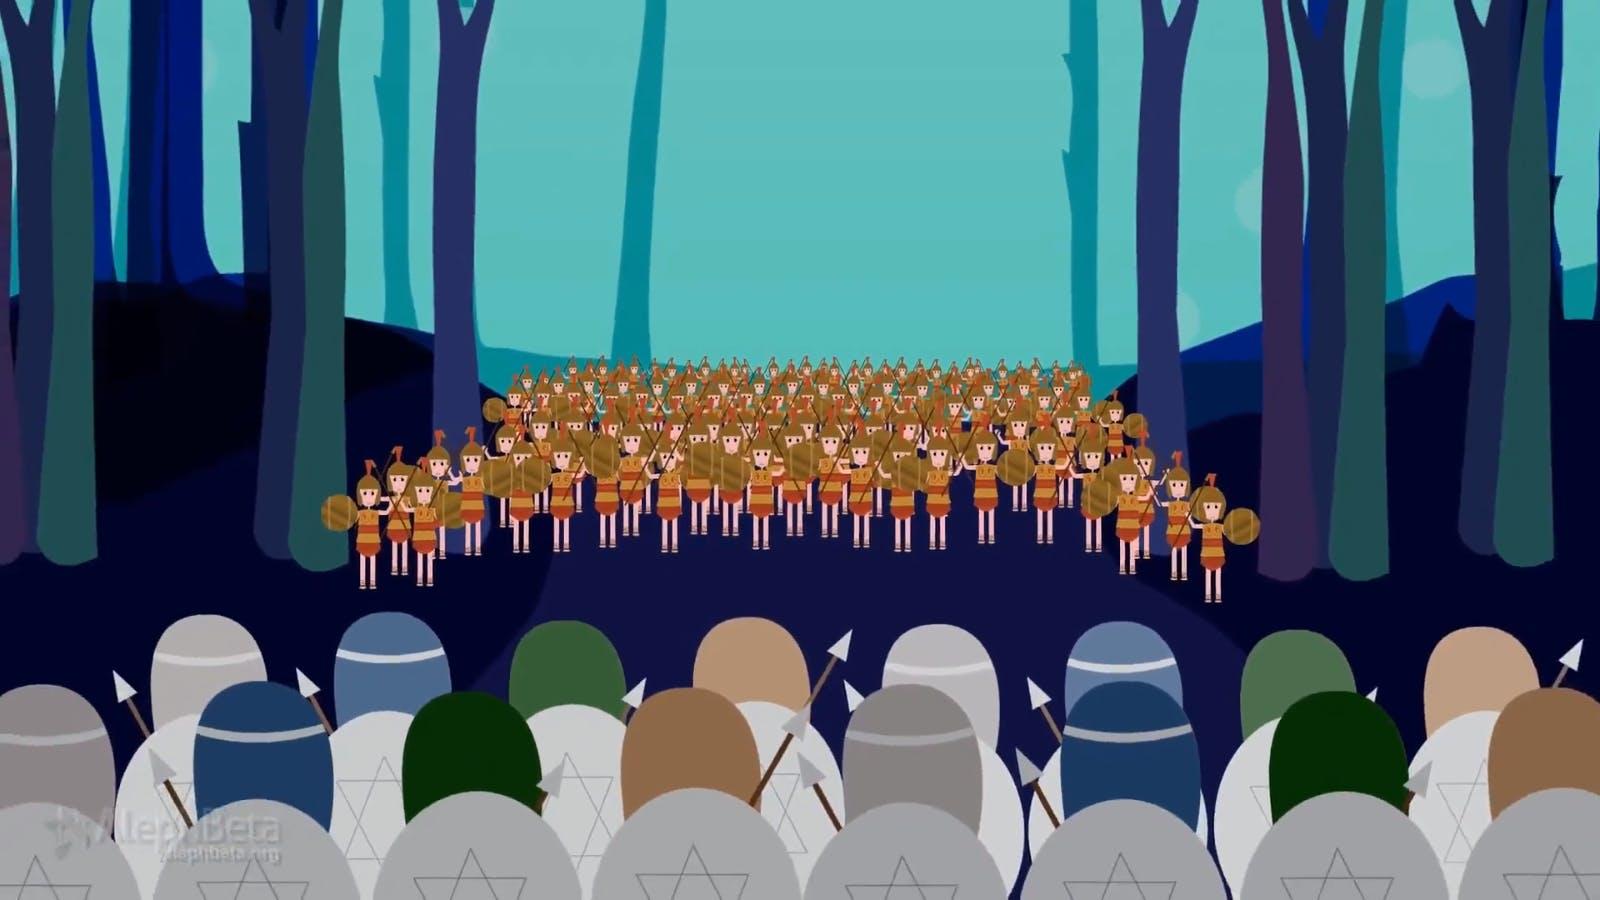 How to celebrate Hanukkah values today